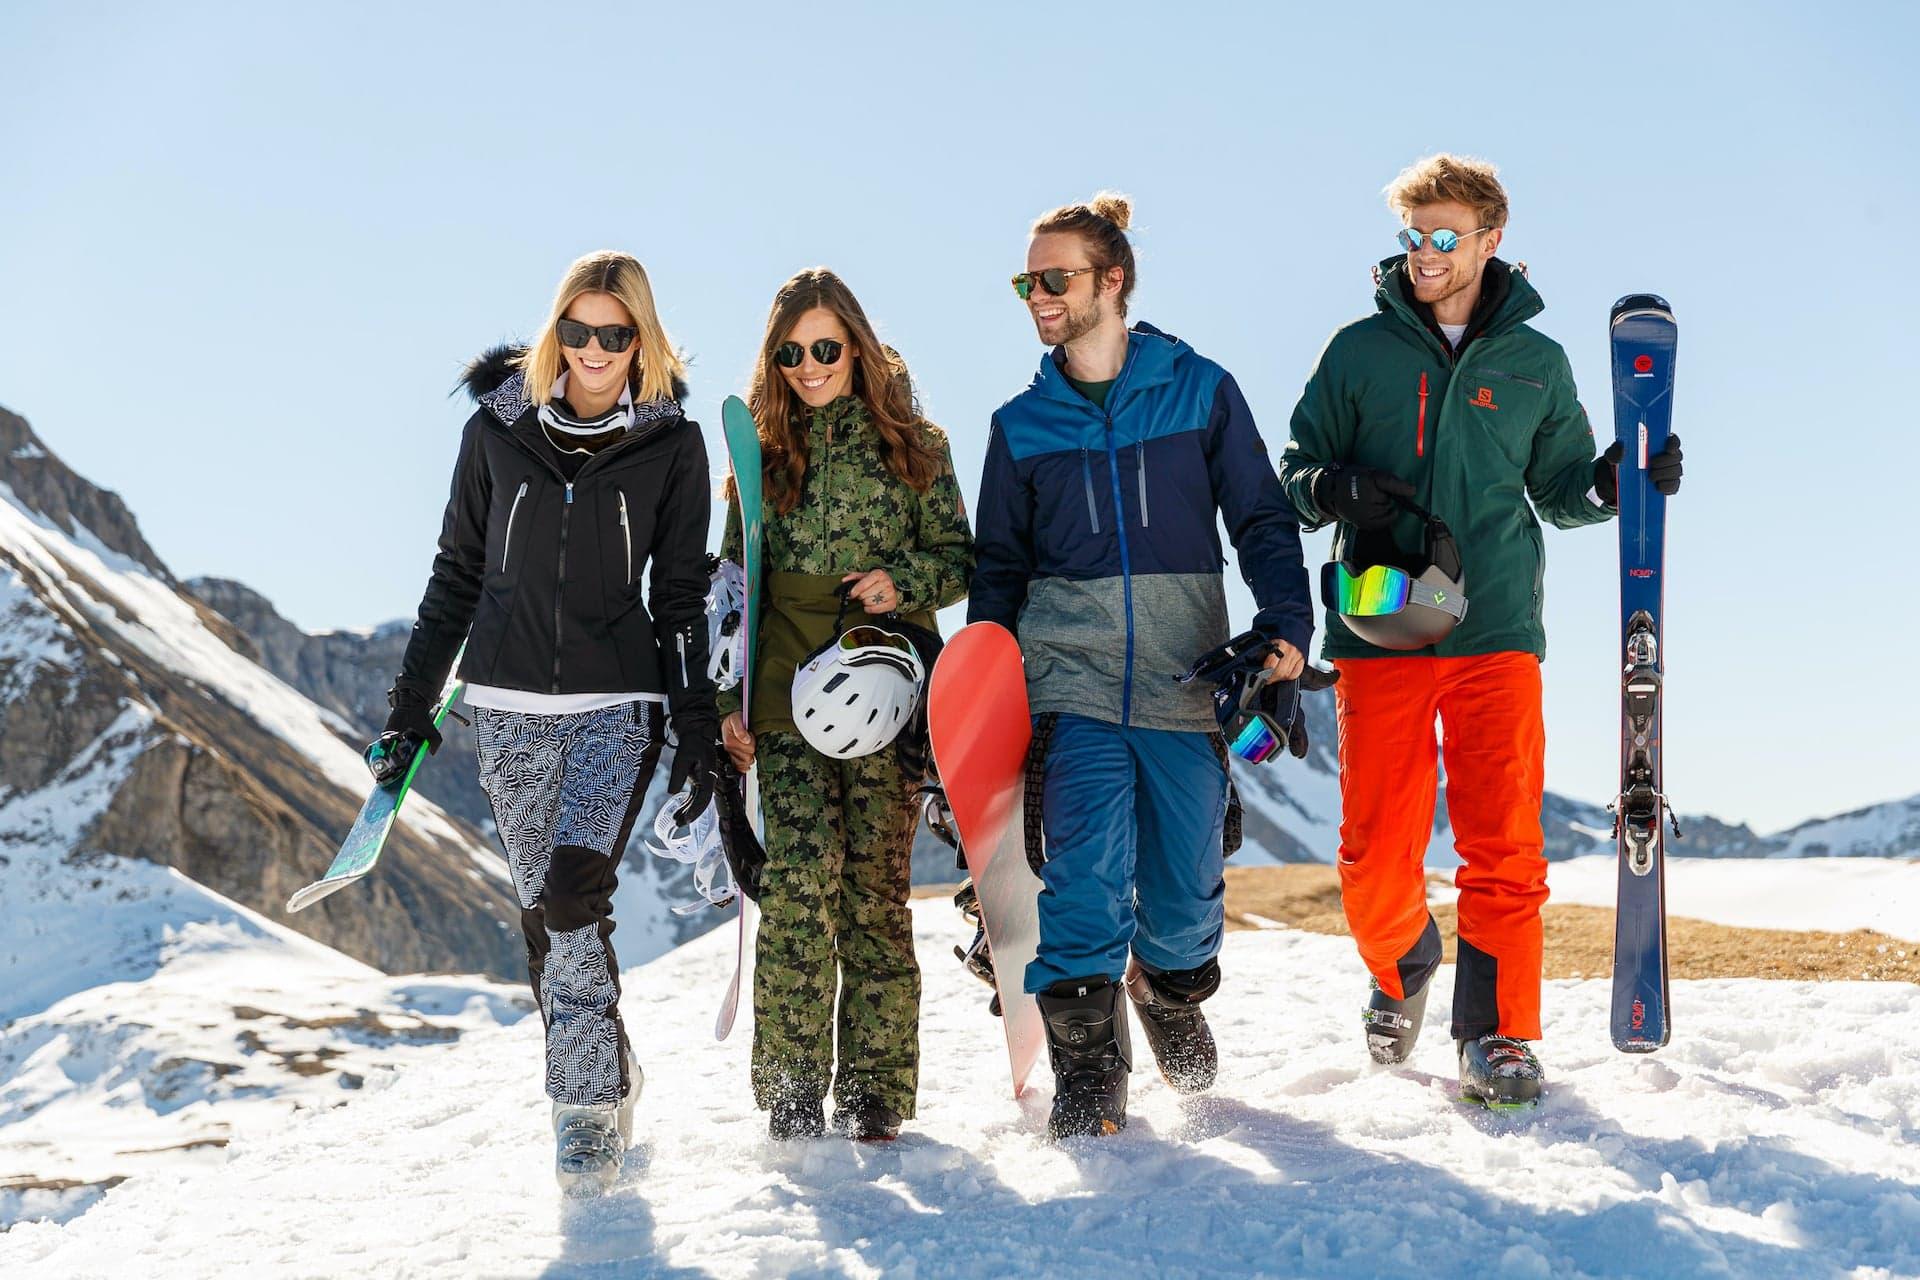 Ski- & Board-Verleih